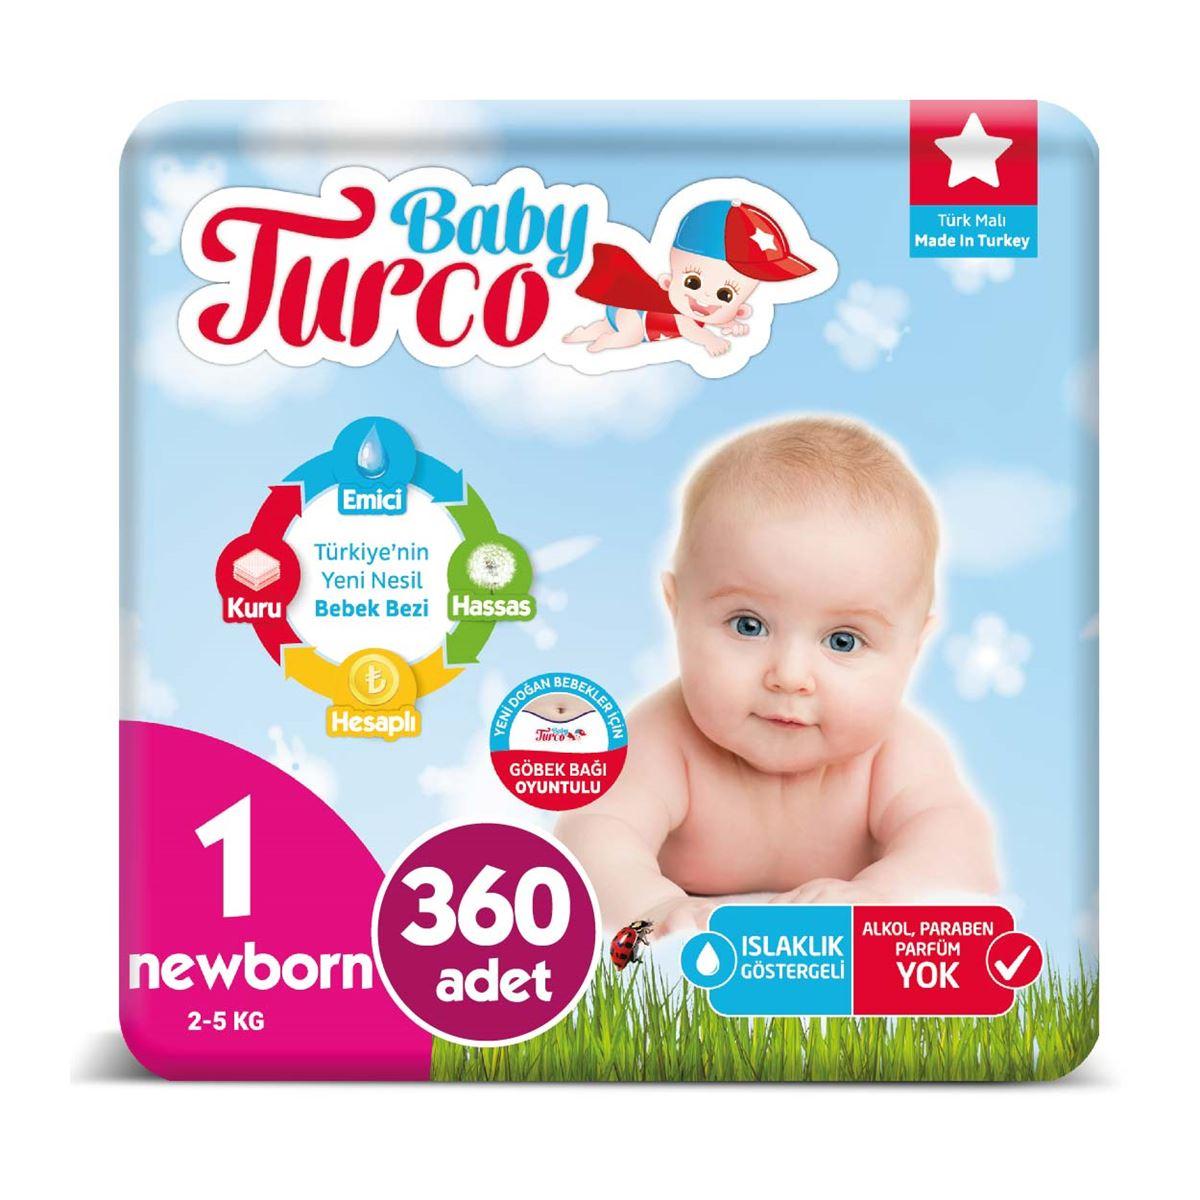 Baby Turco Bebek Bezi 1 Numara Newborn 360 Adet